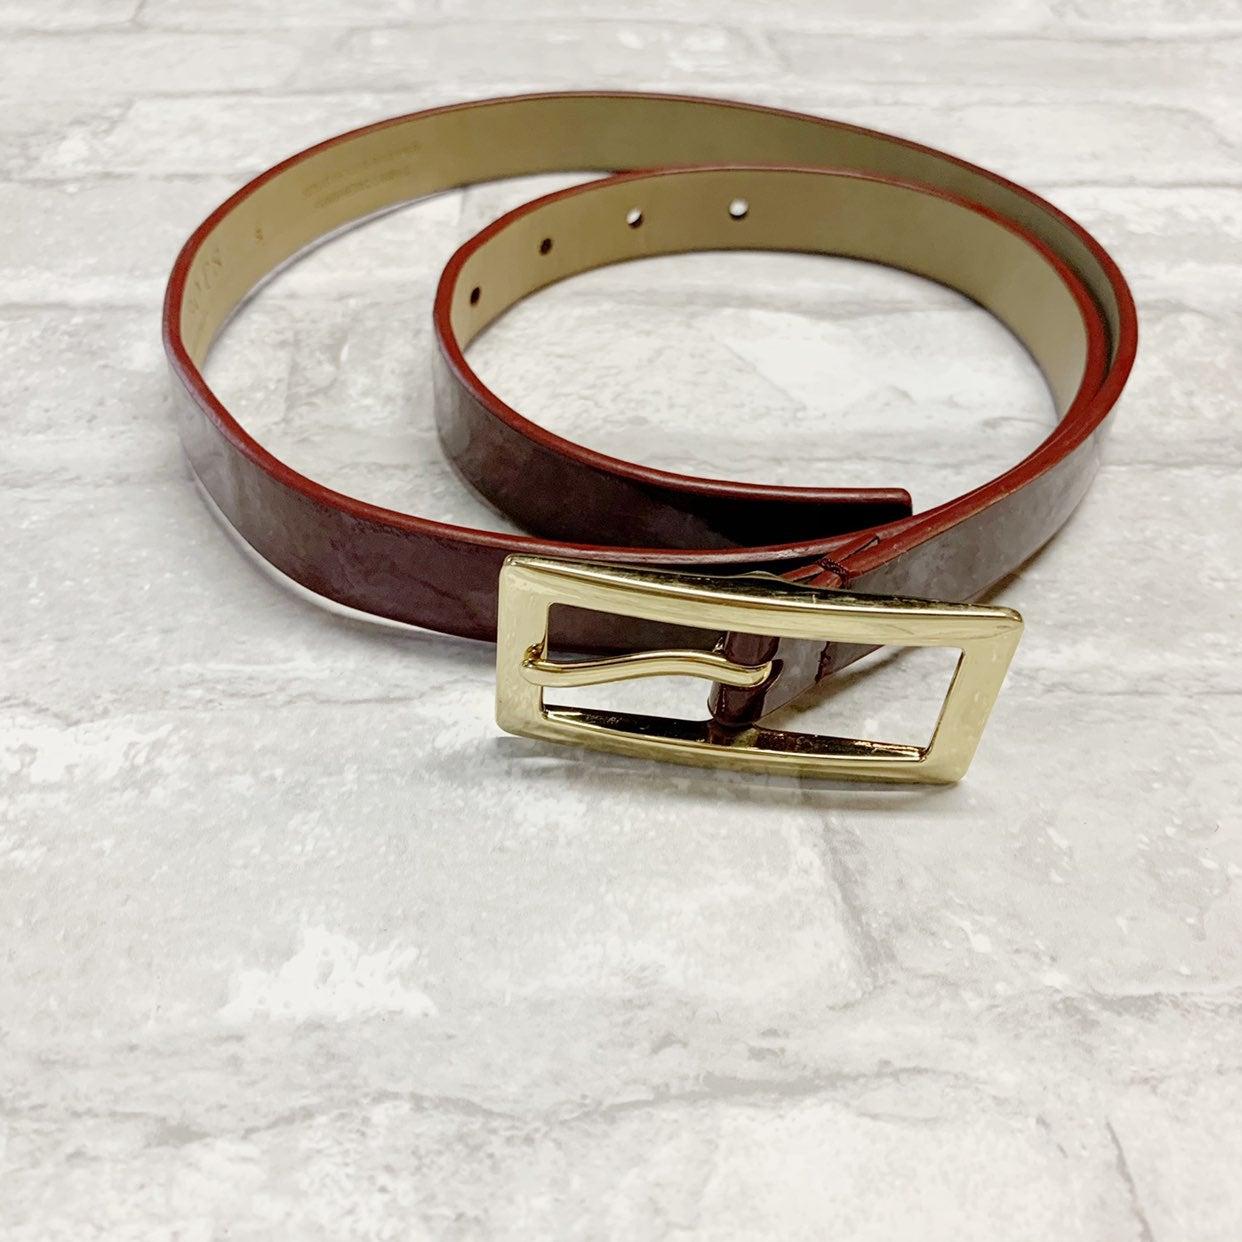 Talbots patent leather burgundy red belt